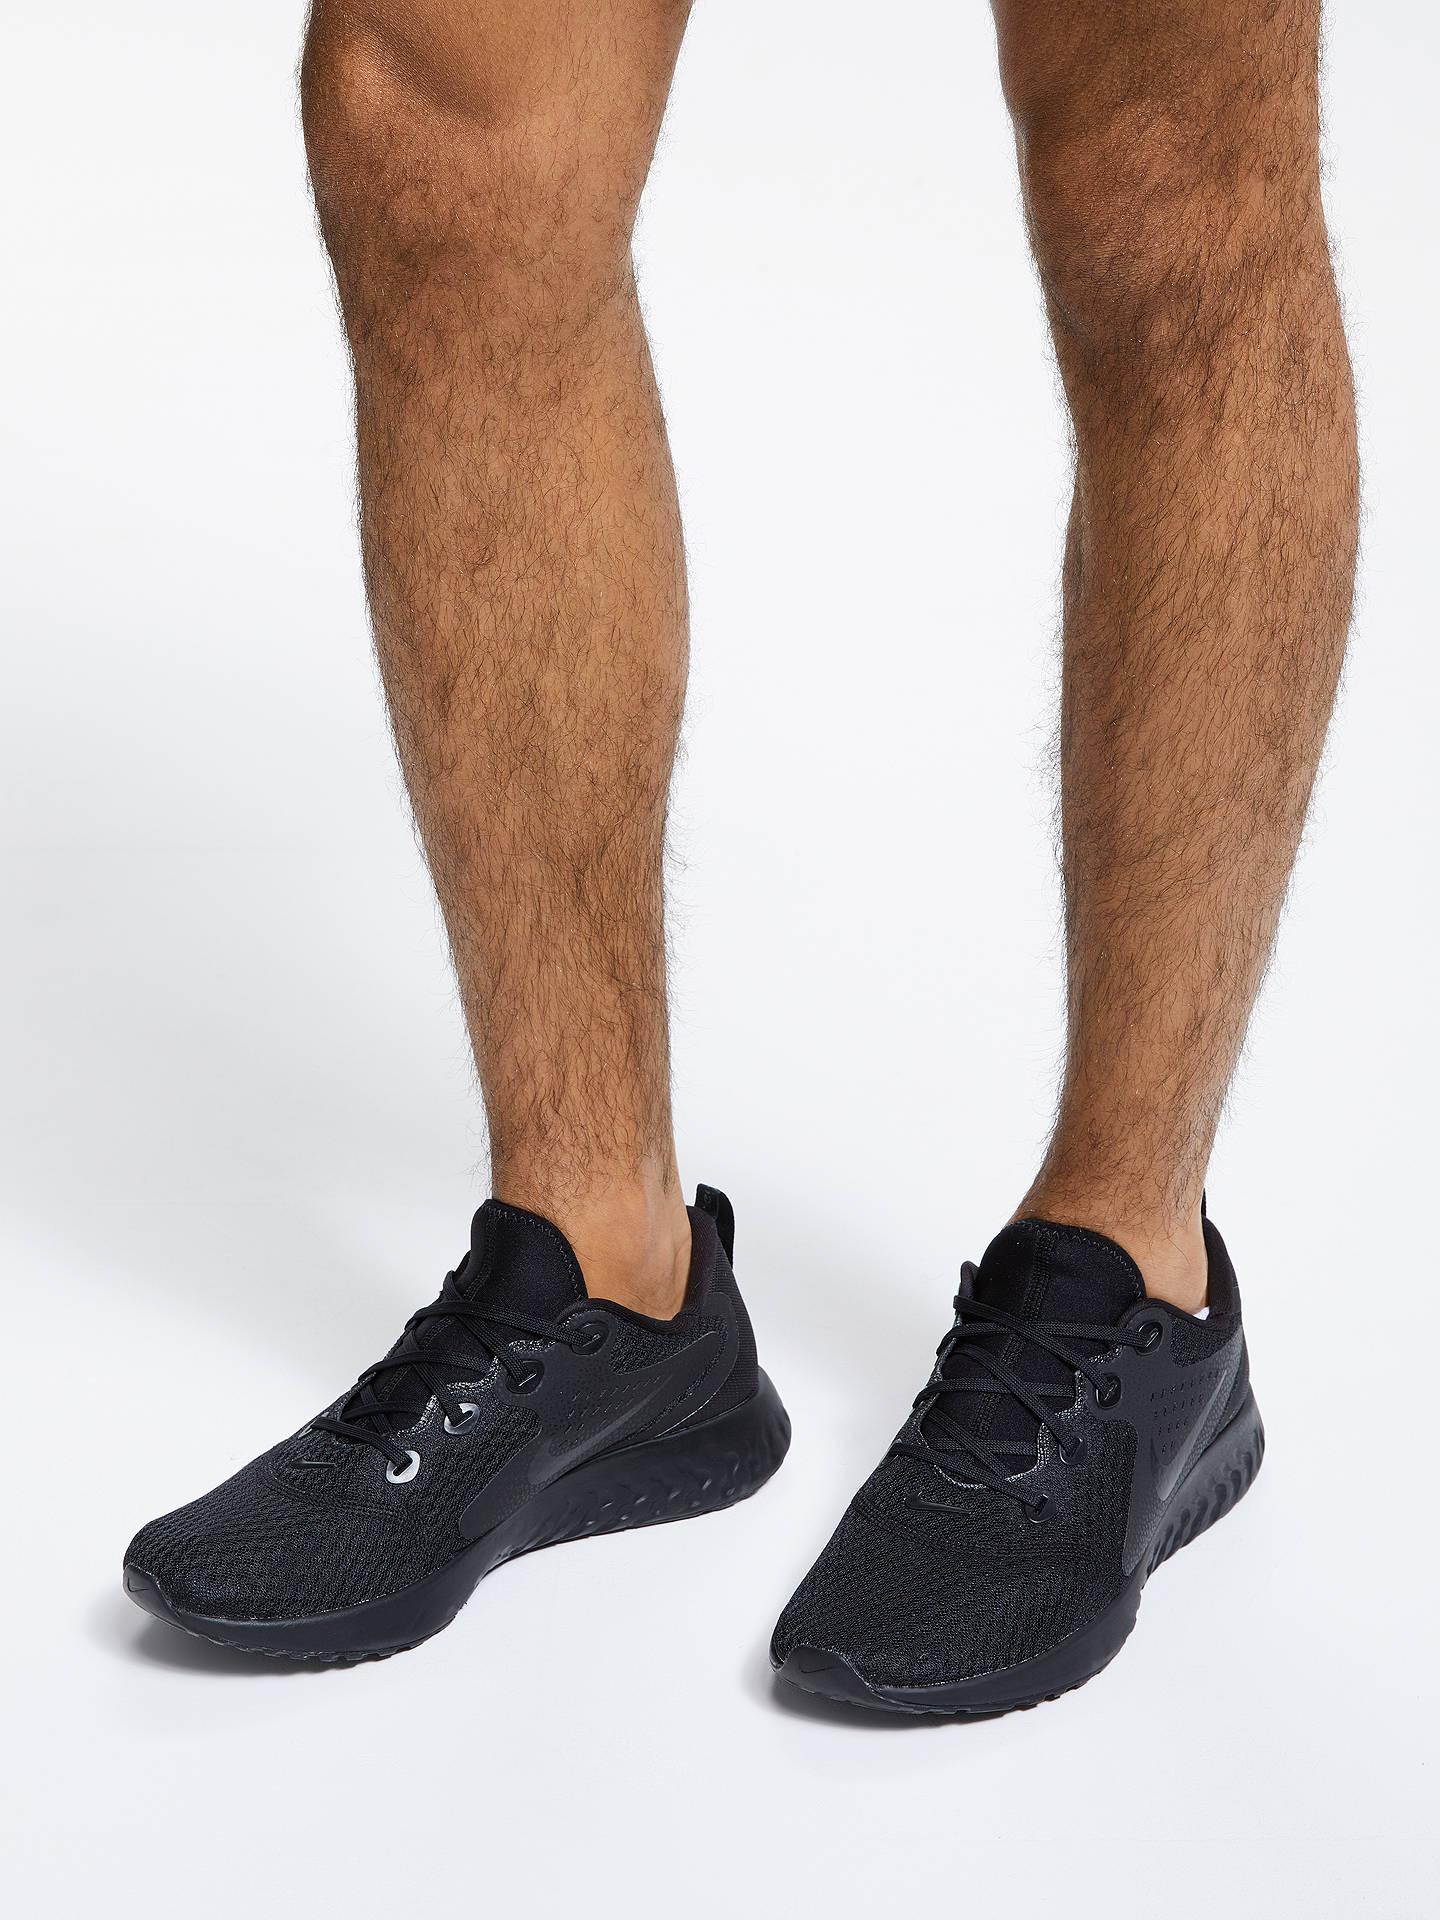 fb8ce6b6d1b04 Nike Legend React Men s Running Shoe at John Lewis   Partners